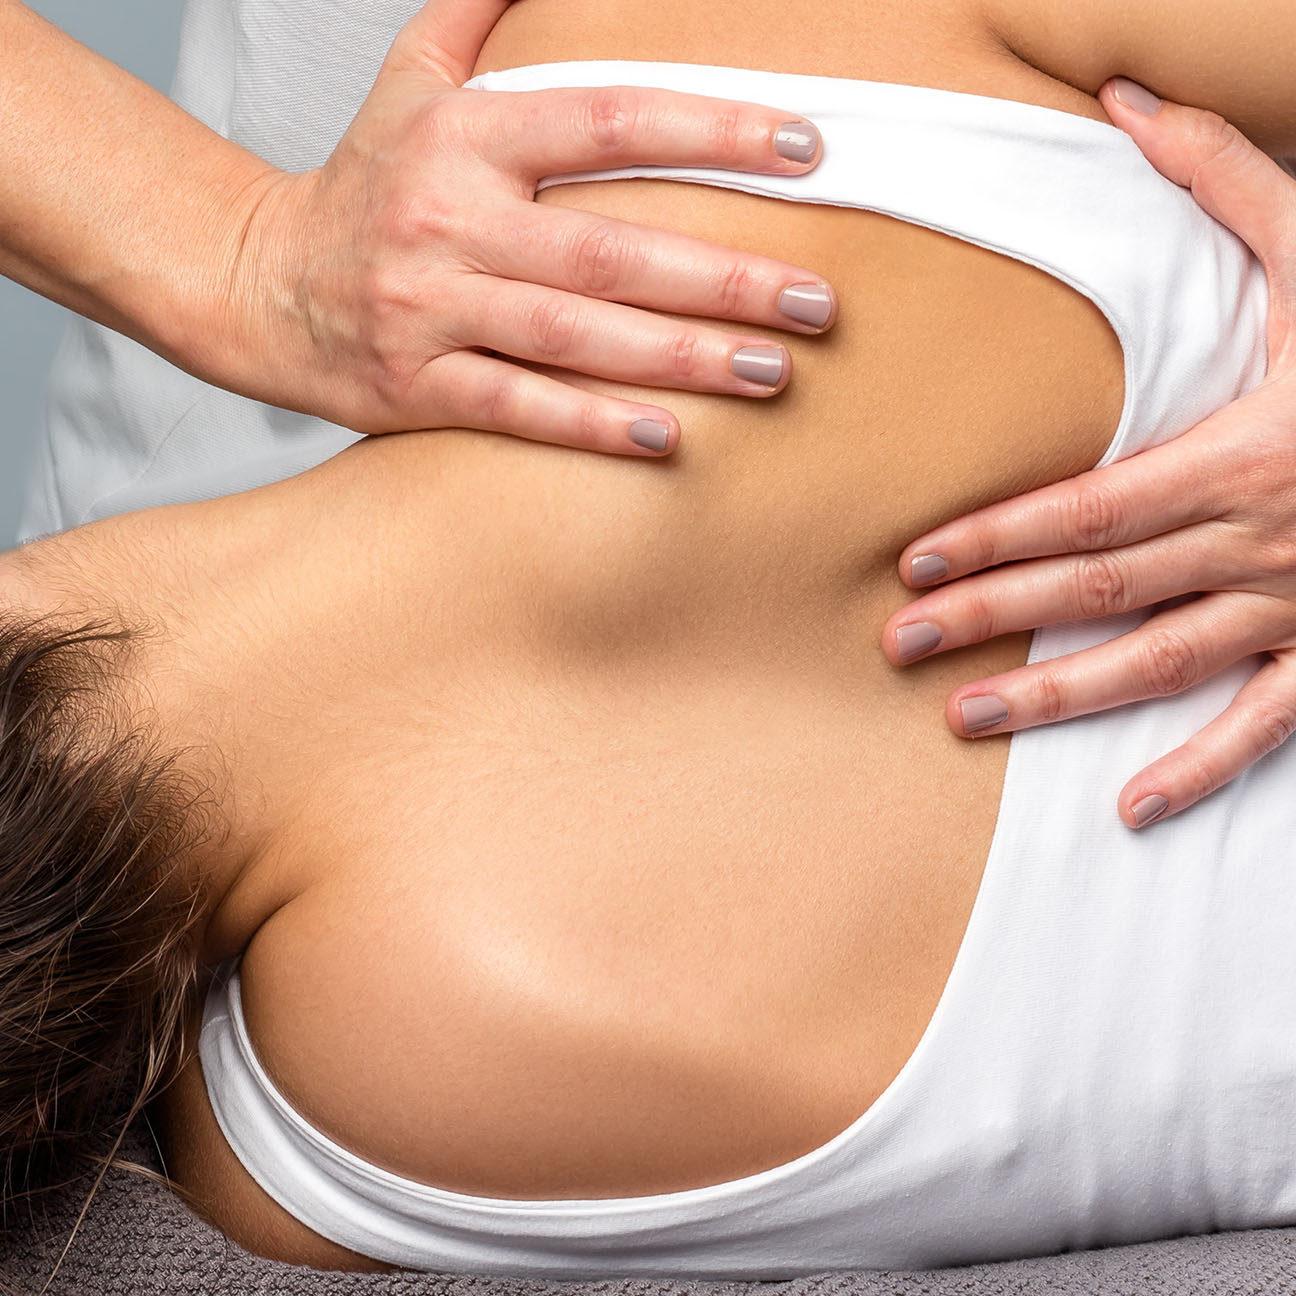 Detail of female therapist manipulating shoulder blade on patient.